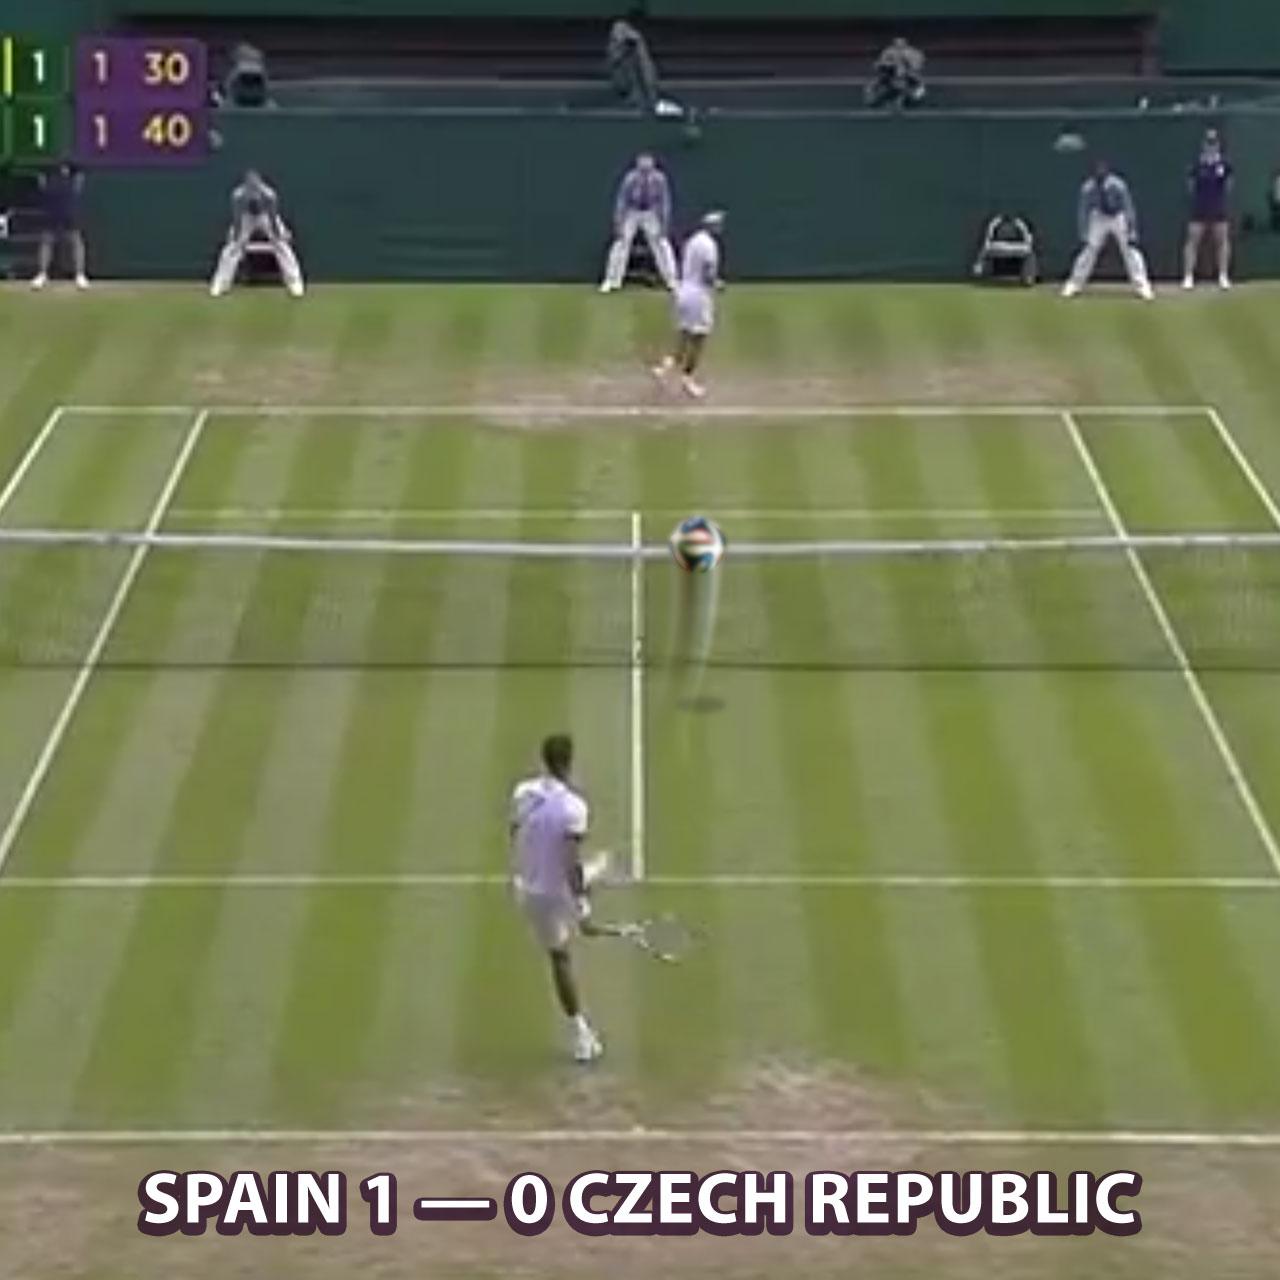 Rafael Nadal and Lukas Rosol engage in football at Wimbledon